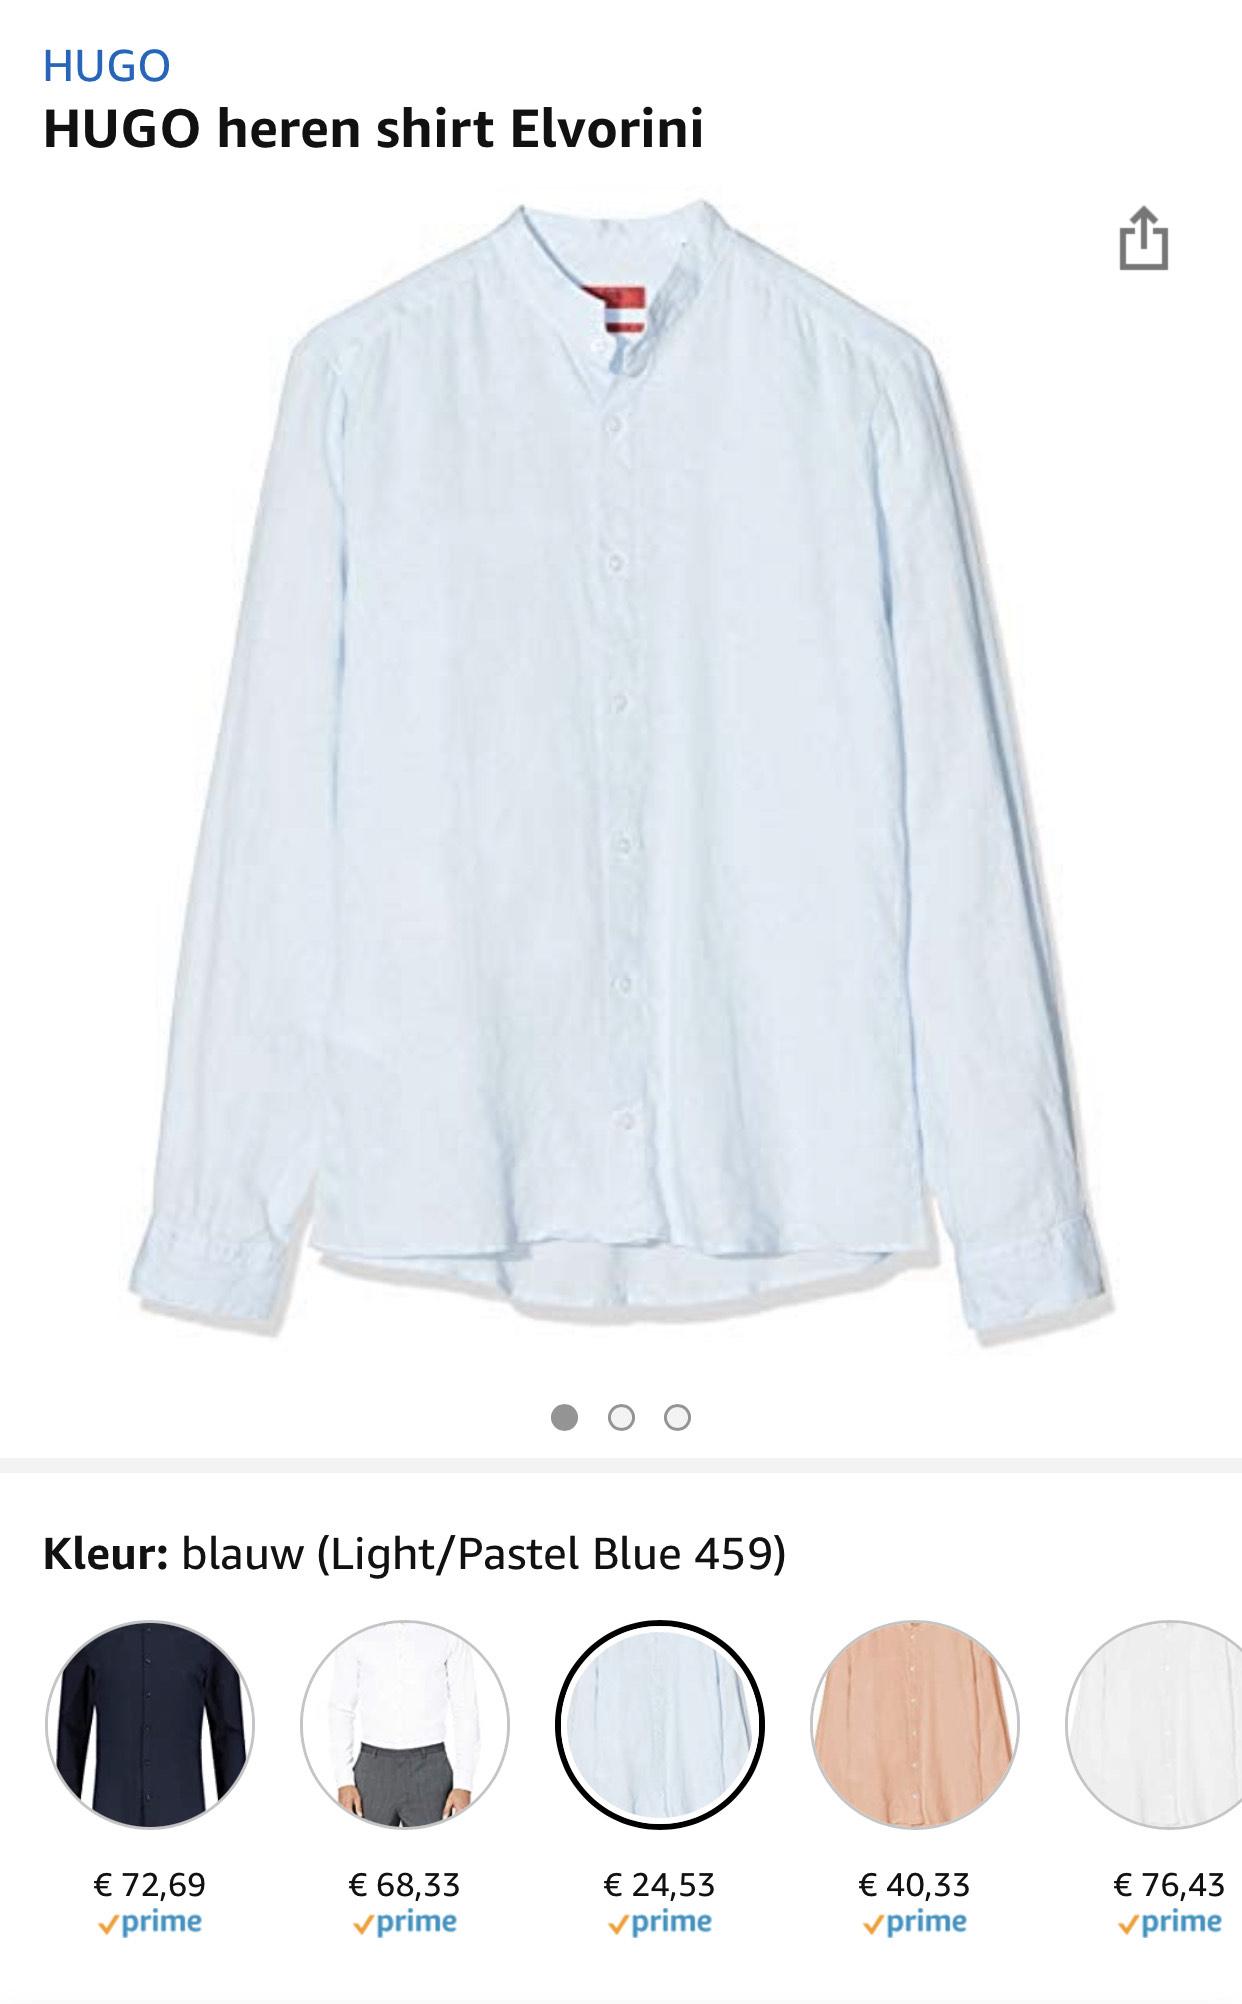 HUGO heren shirt Elvorini vanaf €24,53